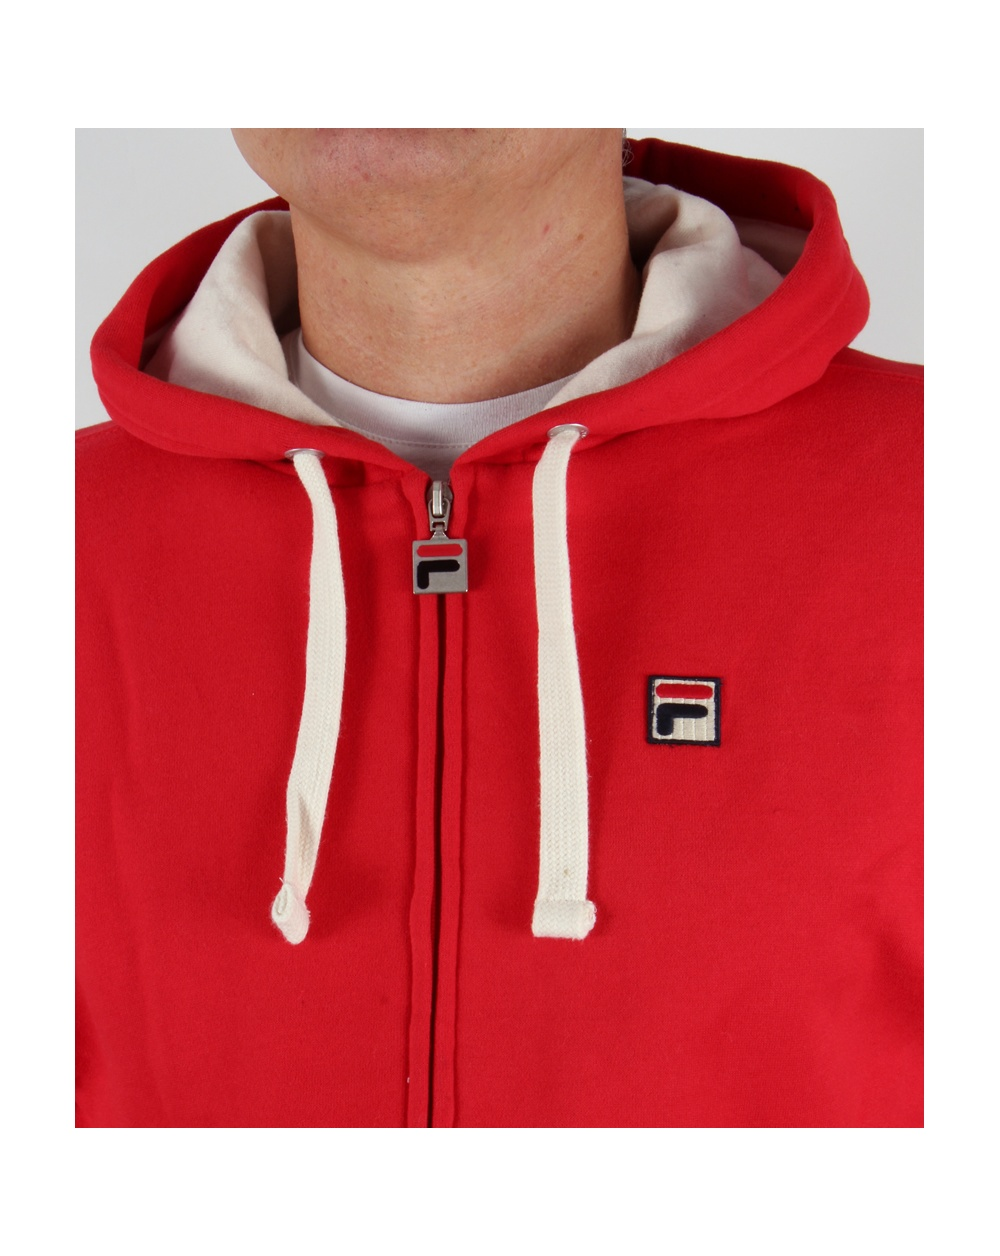 Fila hoodies